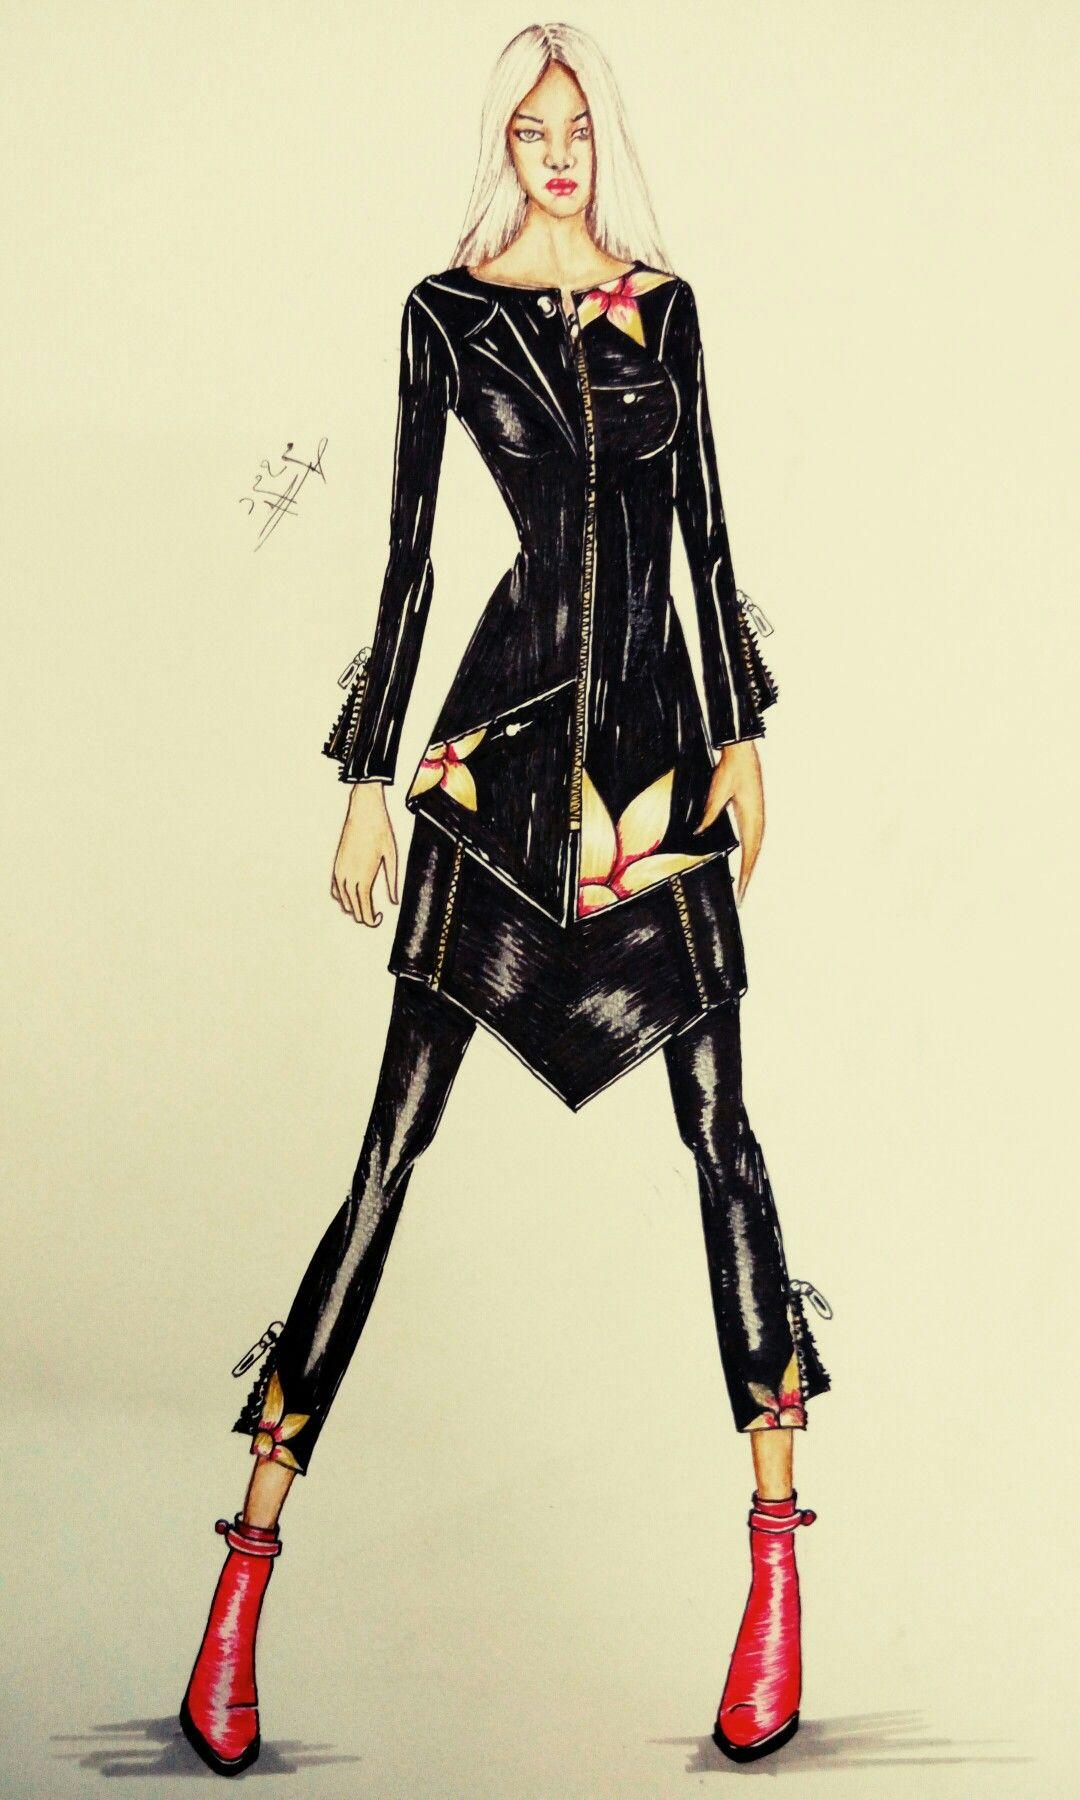 Design By Me Fashion Designer Mohamed Salah Cairo Egypt Fashion Fashion Design My Style